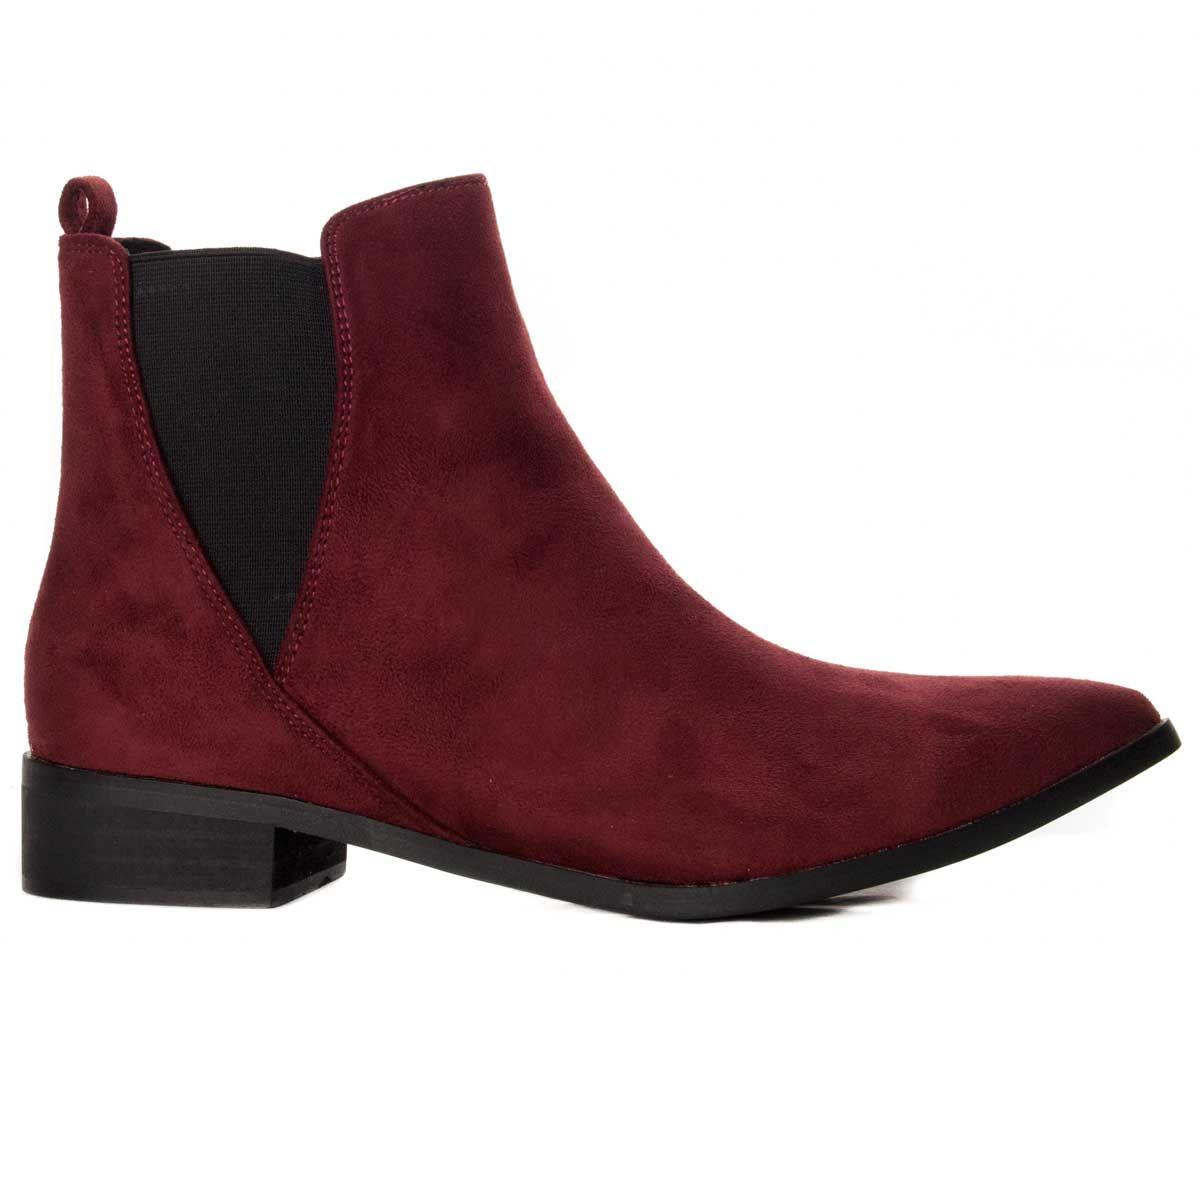 Montevita Pointed Ankle Boot in Bordo